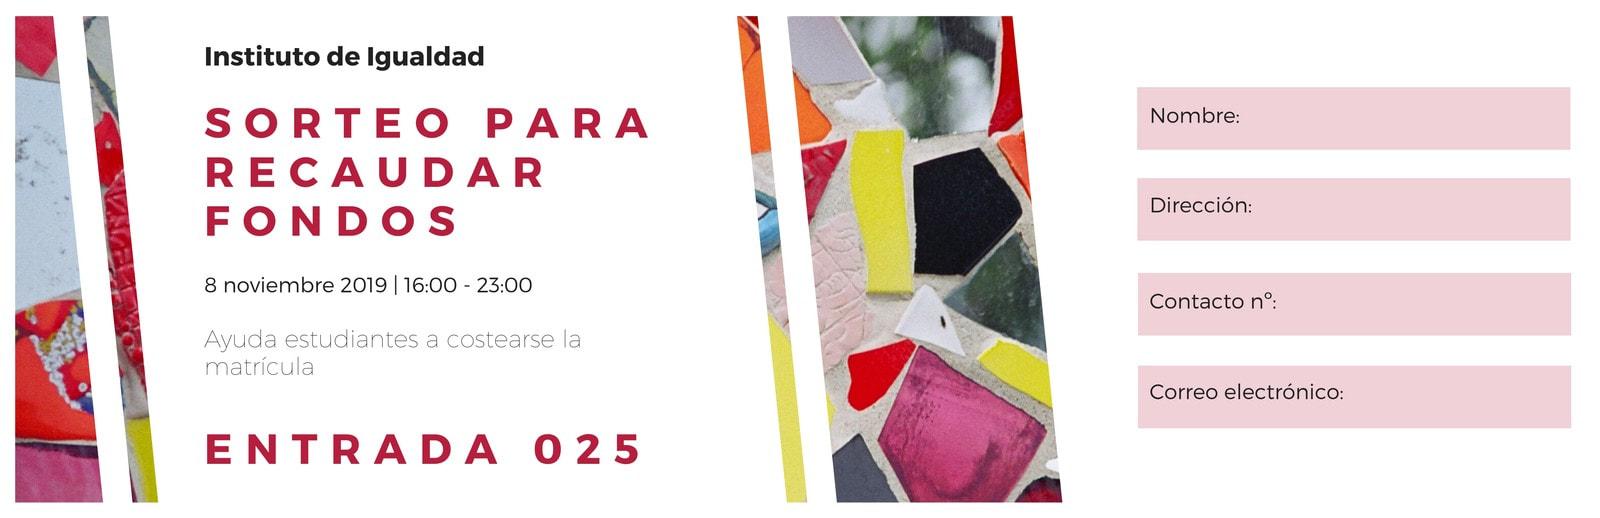 Rosa Blanco Colorido Abstracto Collage Recaudación Fondos Entrada